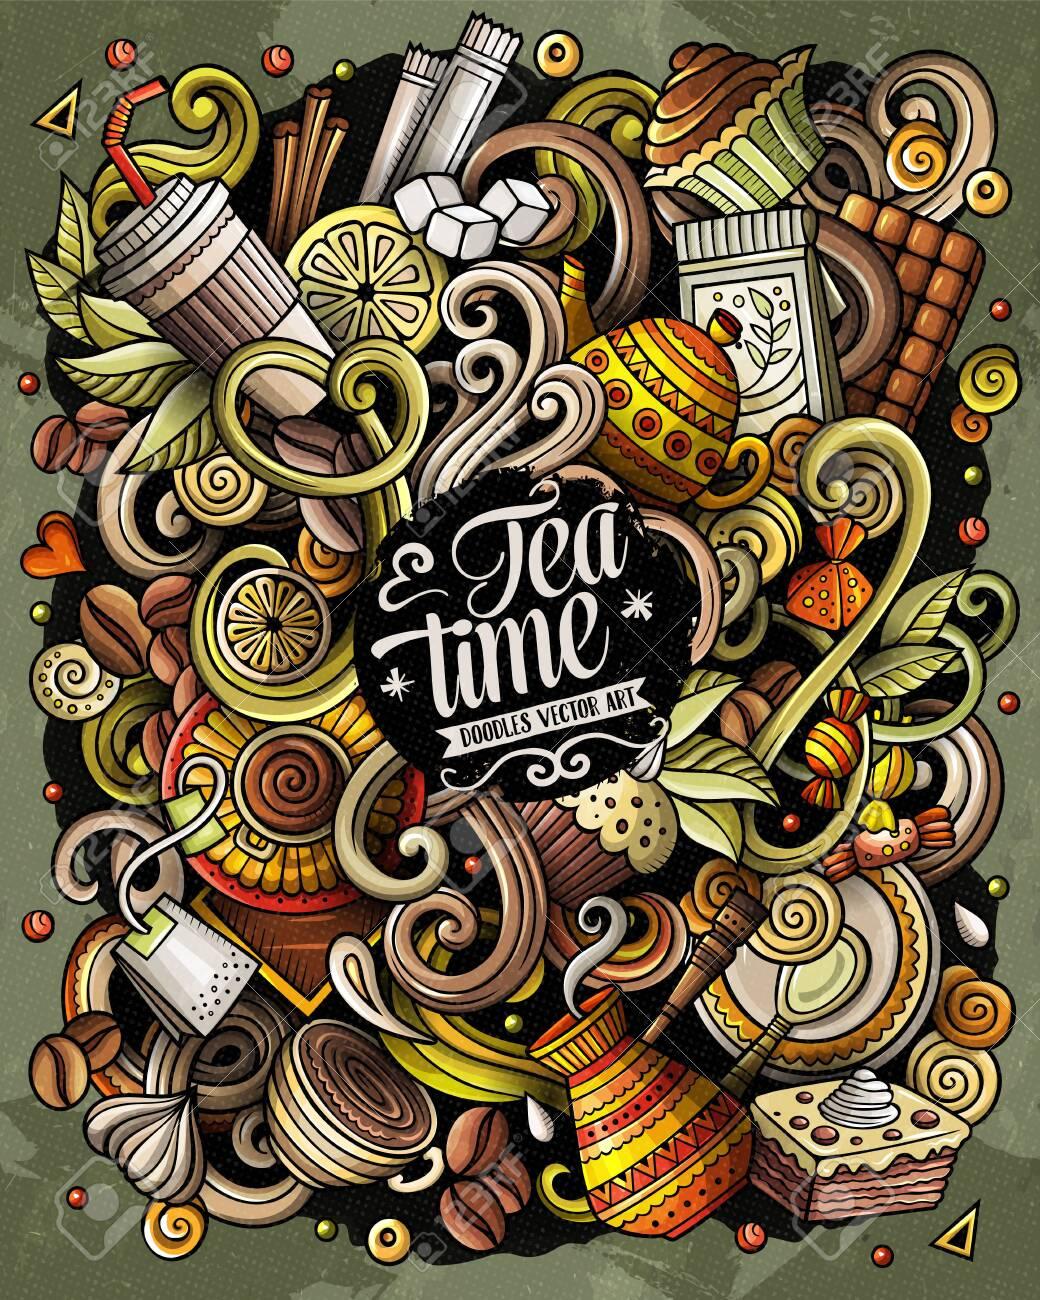 cafe hand drawn vector doodles illustration coffee poster design